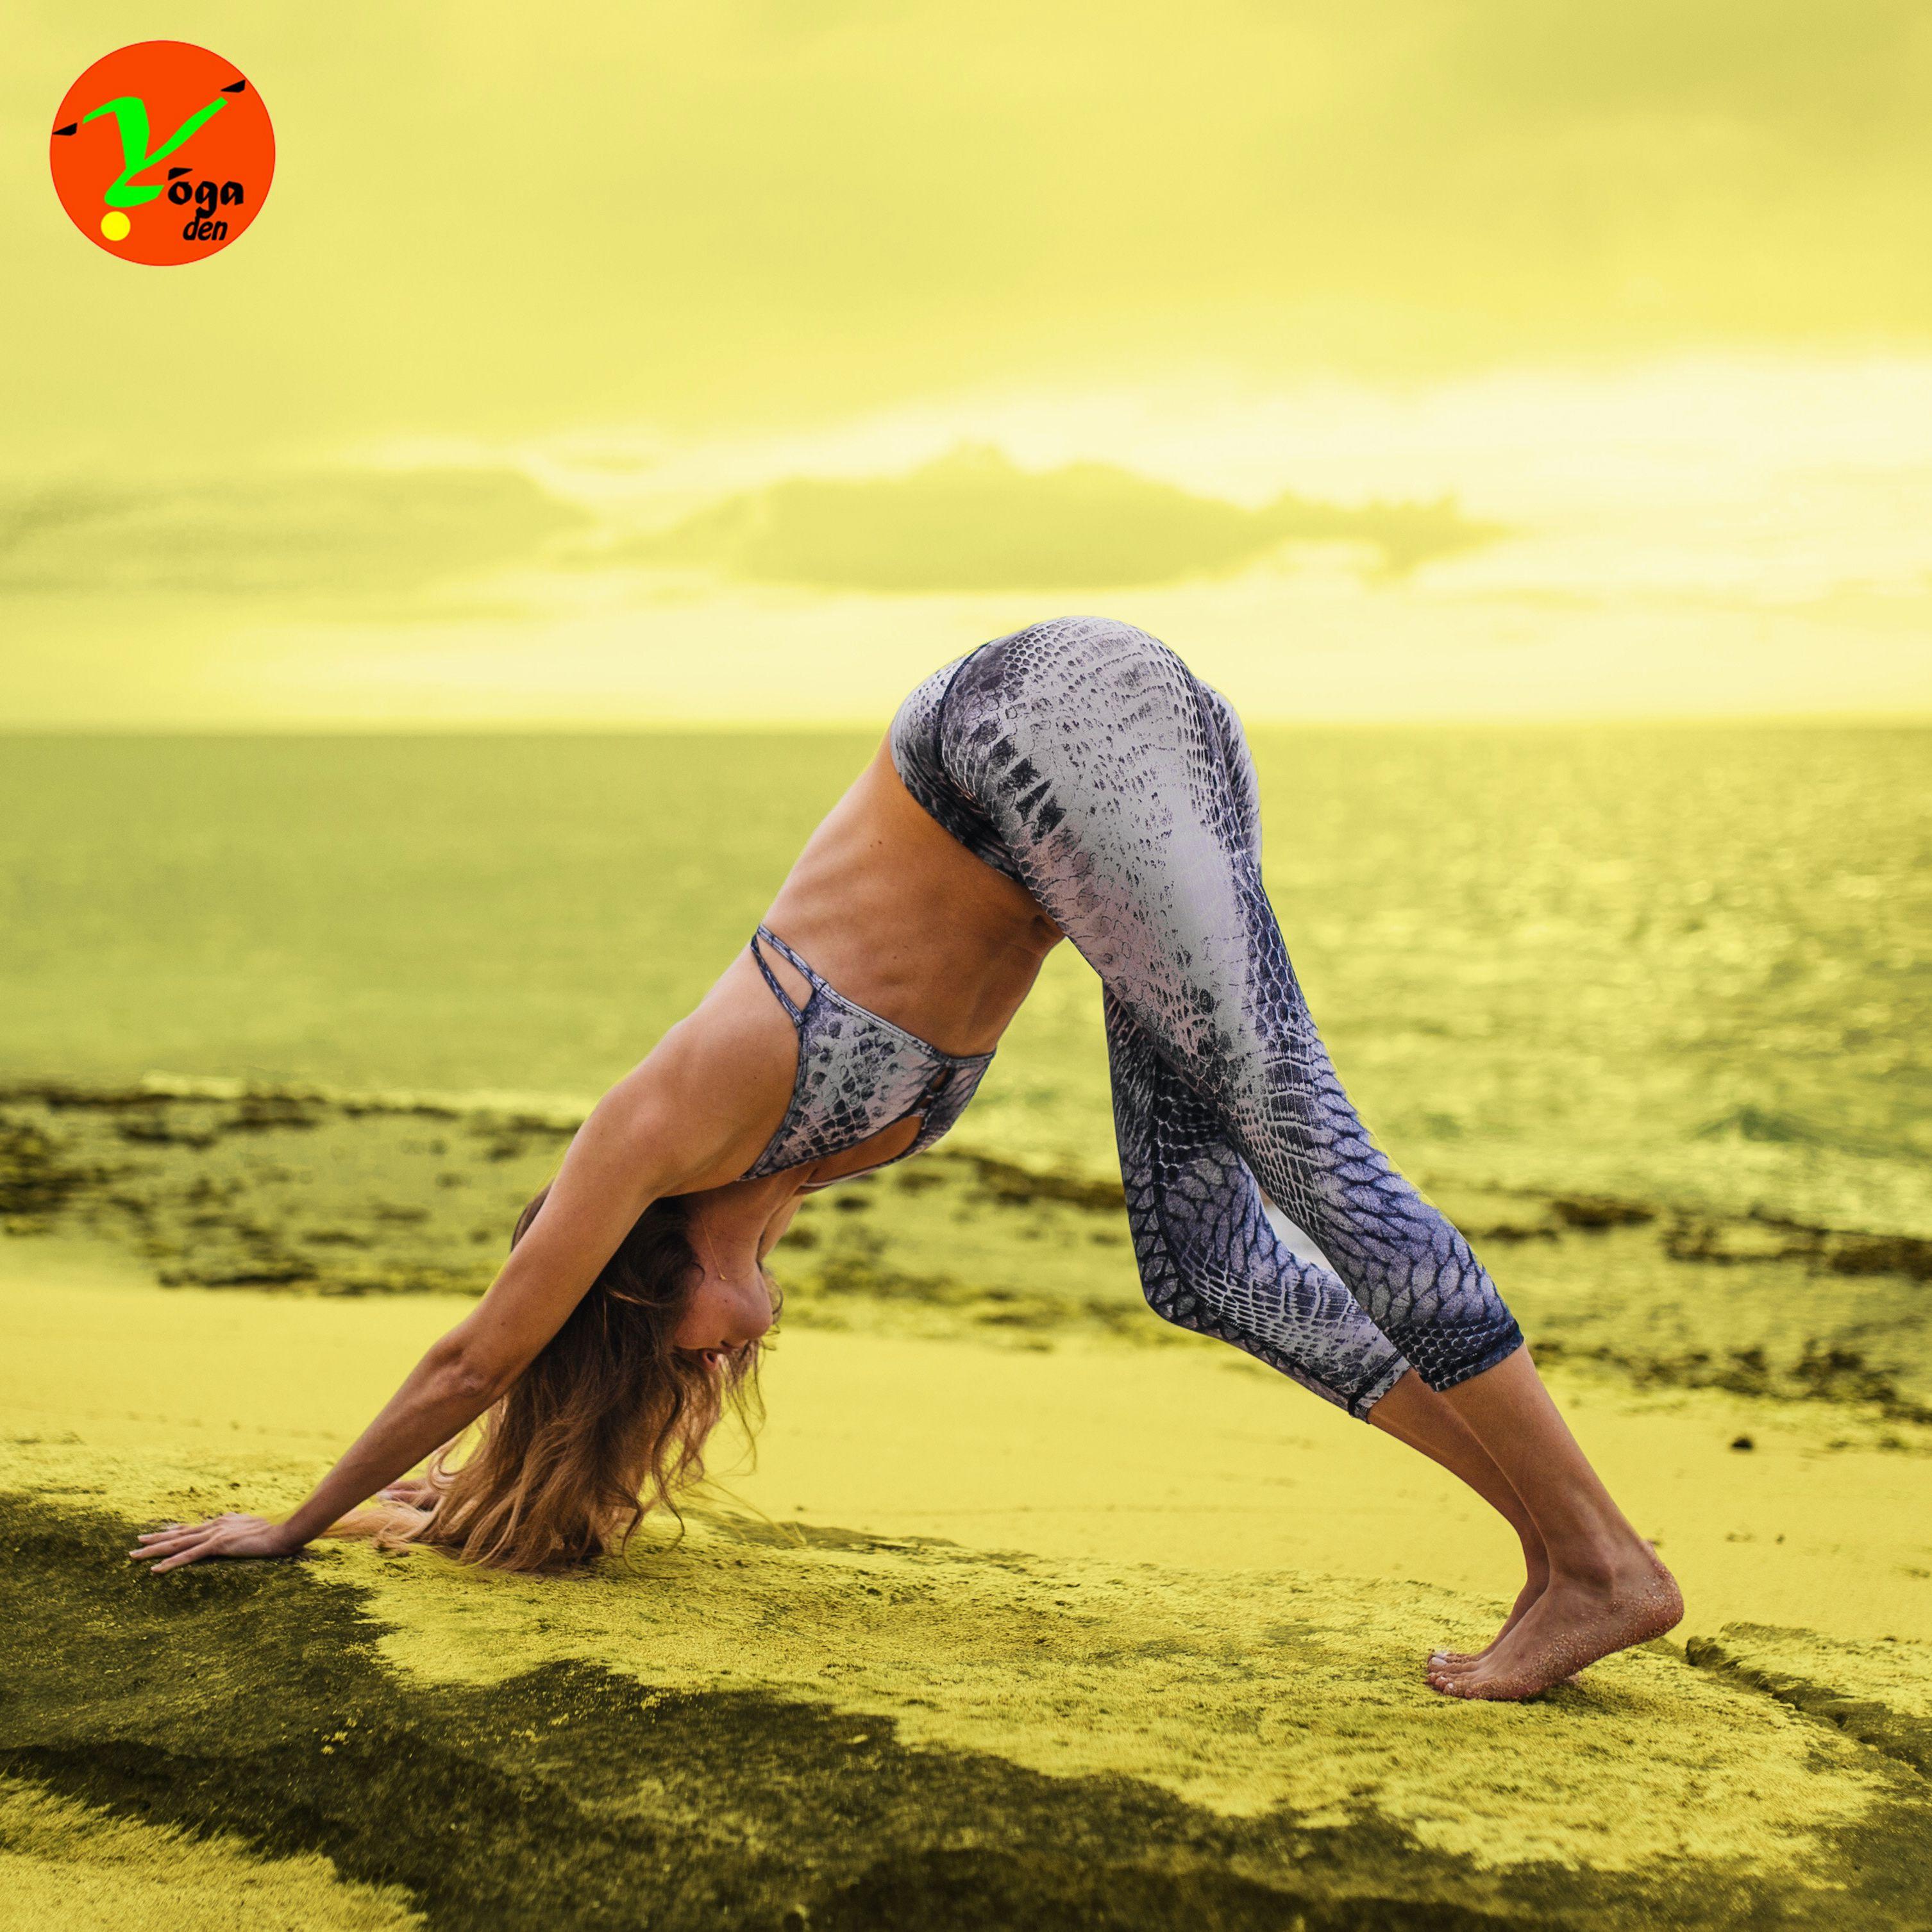 Downward-Facing Dog | Yoga poses, Poses, Yoga